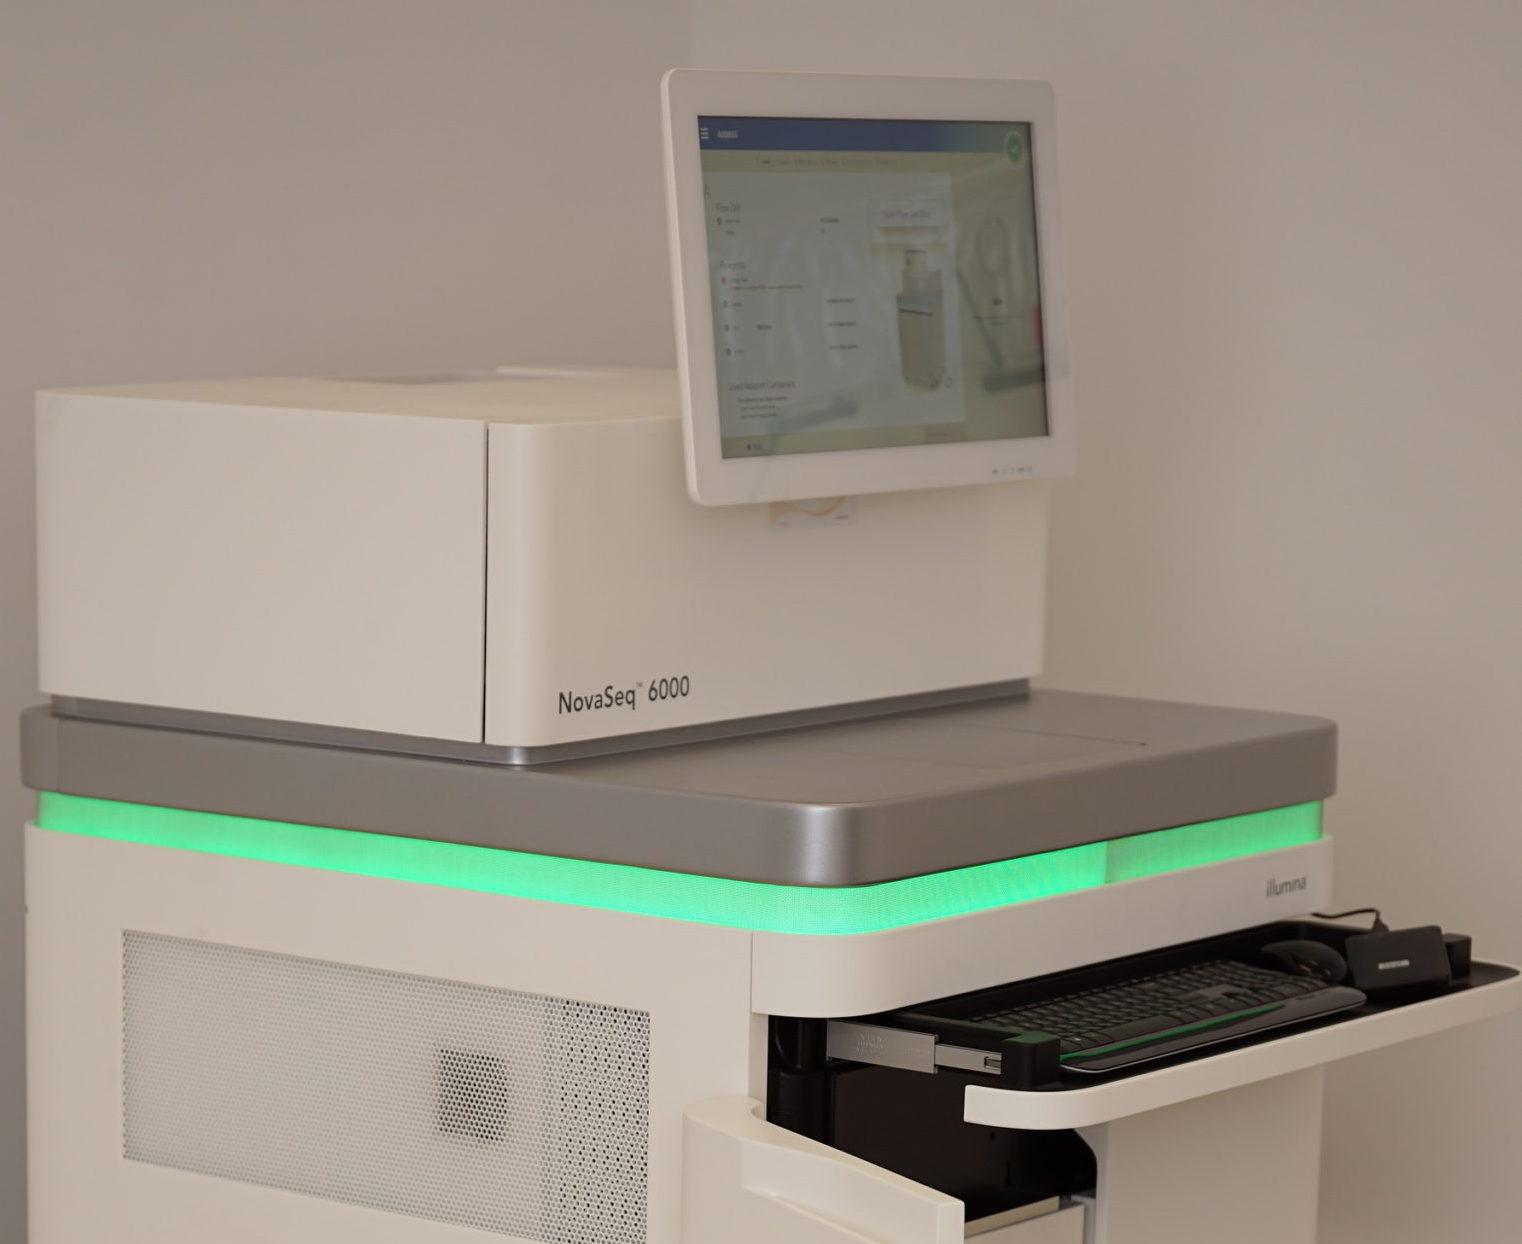 photo of the Illumuina NovaSeq 6000 sequencing system